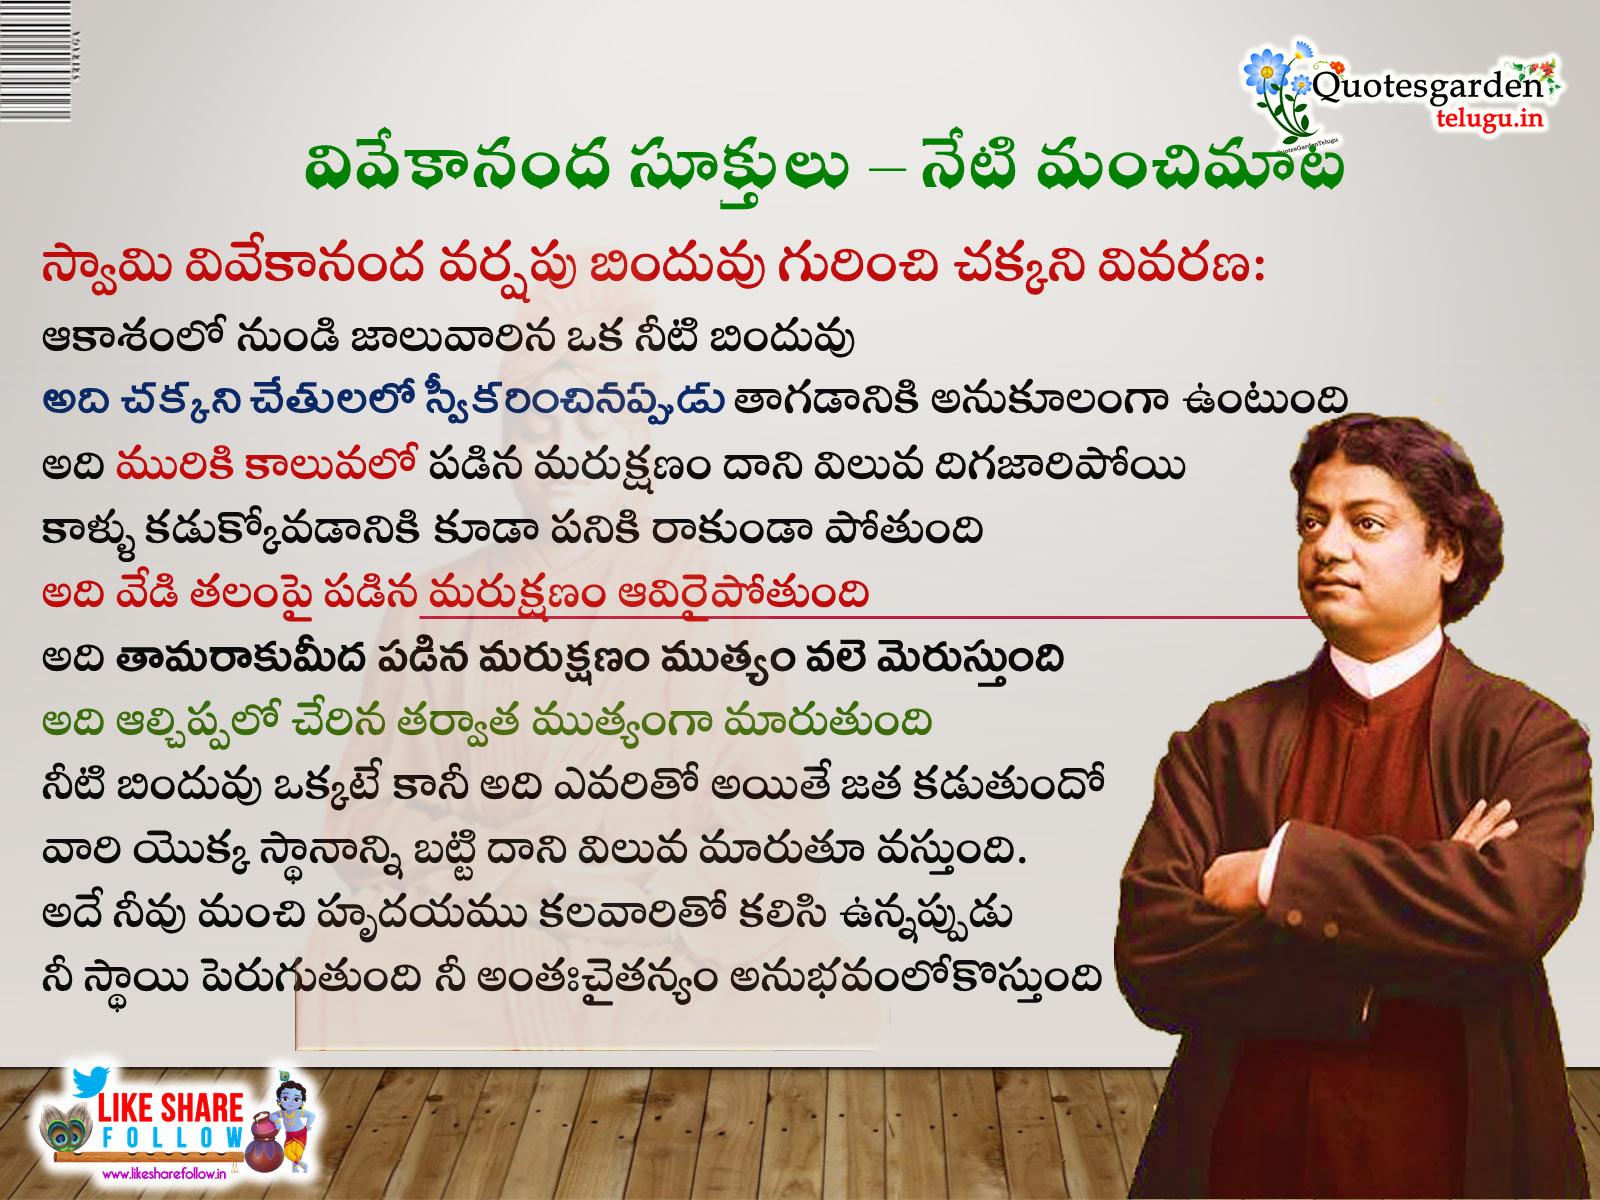 swami vivekananda motivational quotes in telugu like share follow